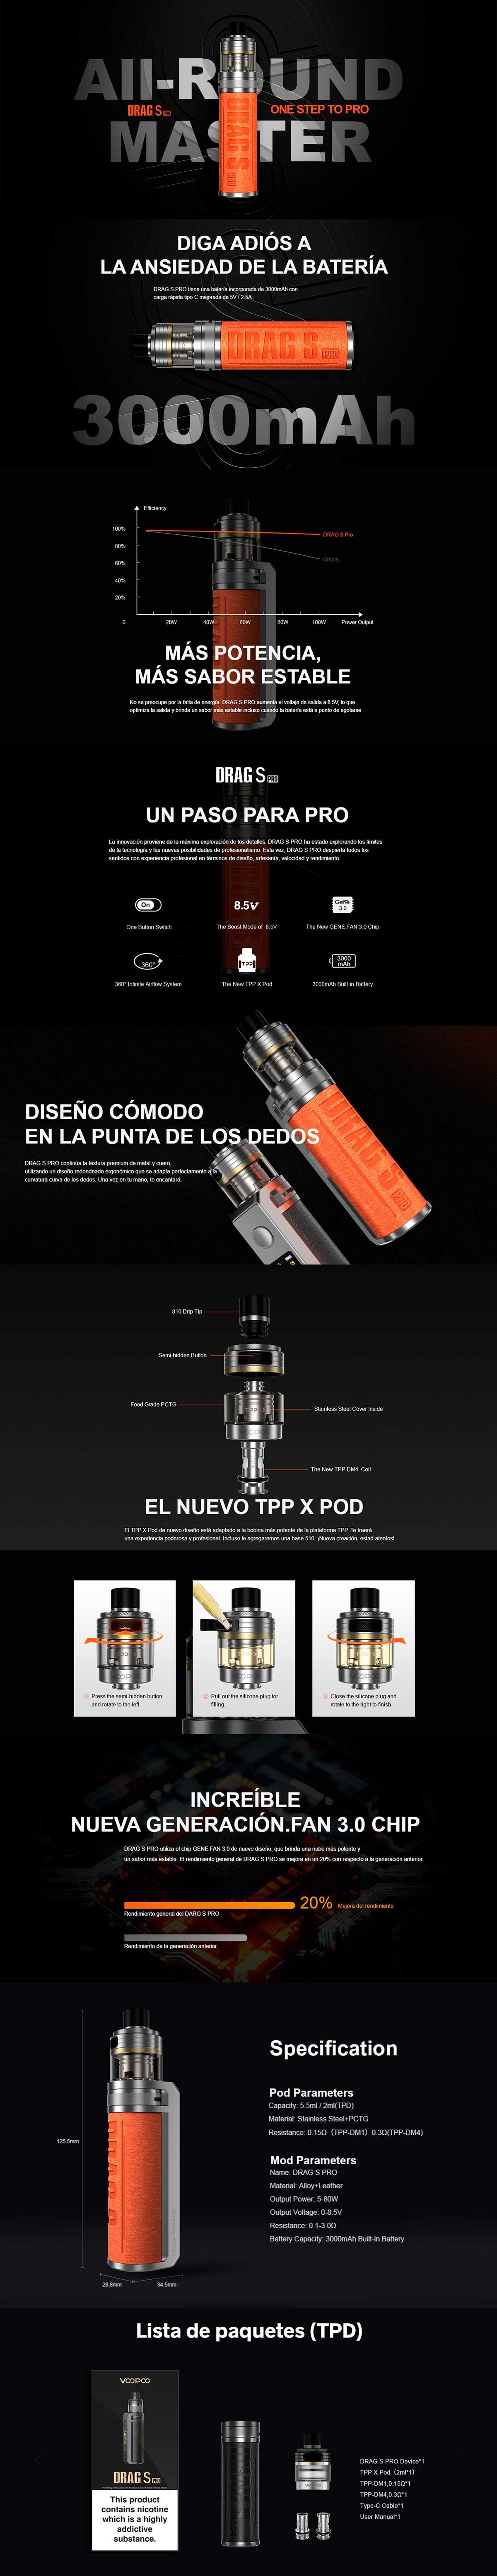 Drag S Pro Voopoo Mod Pod, detalle